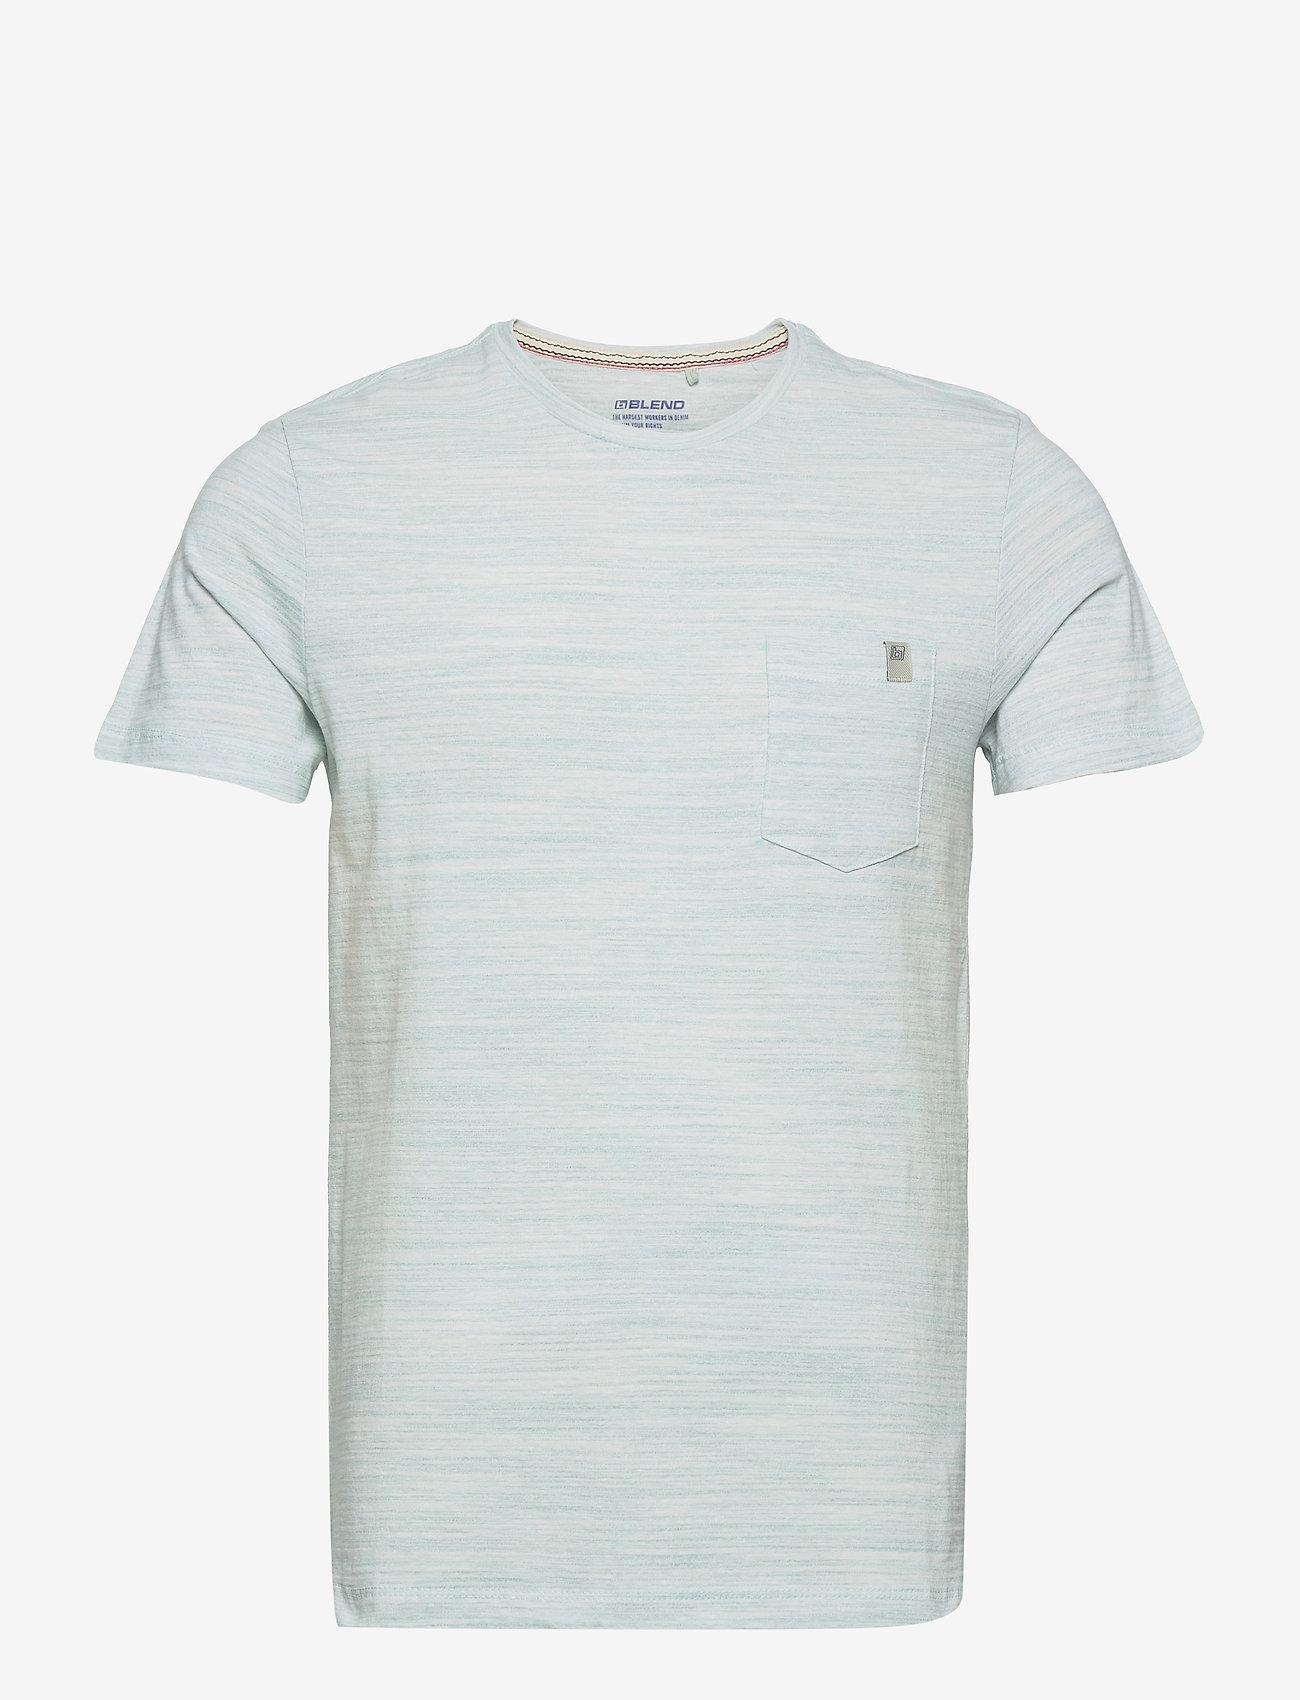 Blend - Tee - basic t-shirts - pastel turquoise - 0